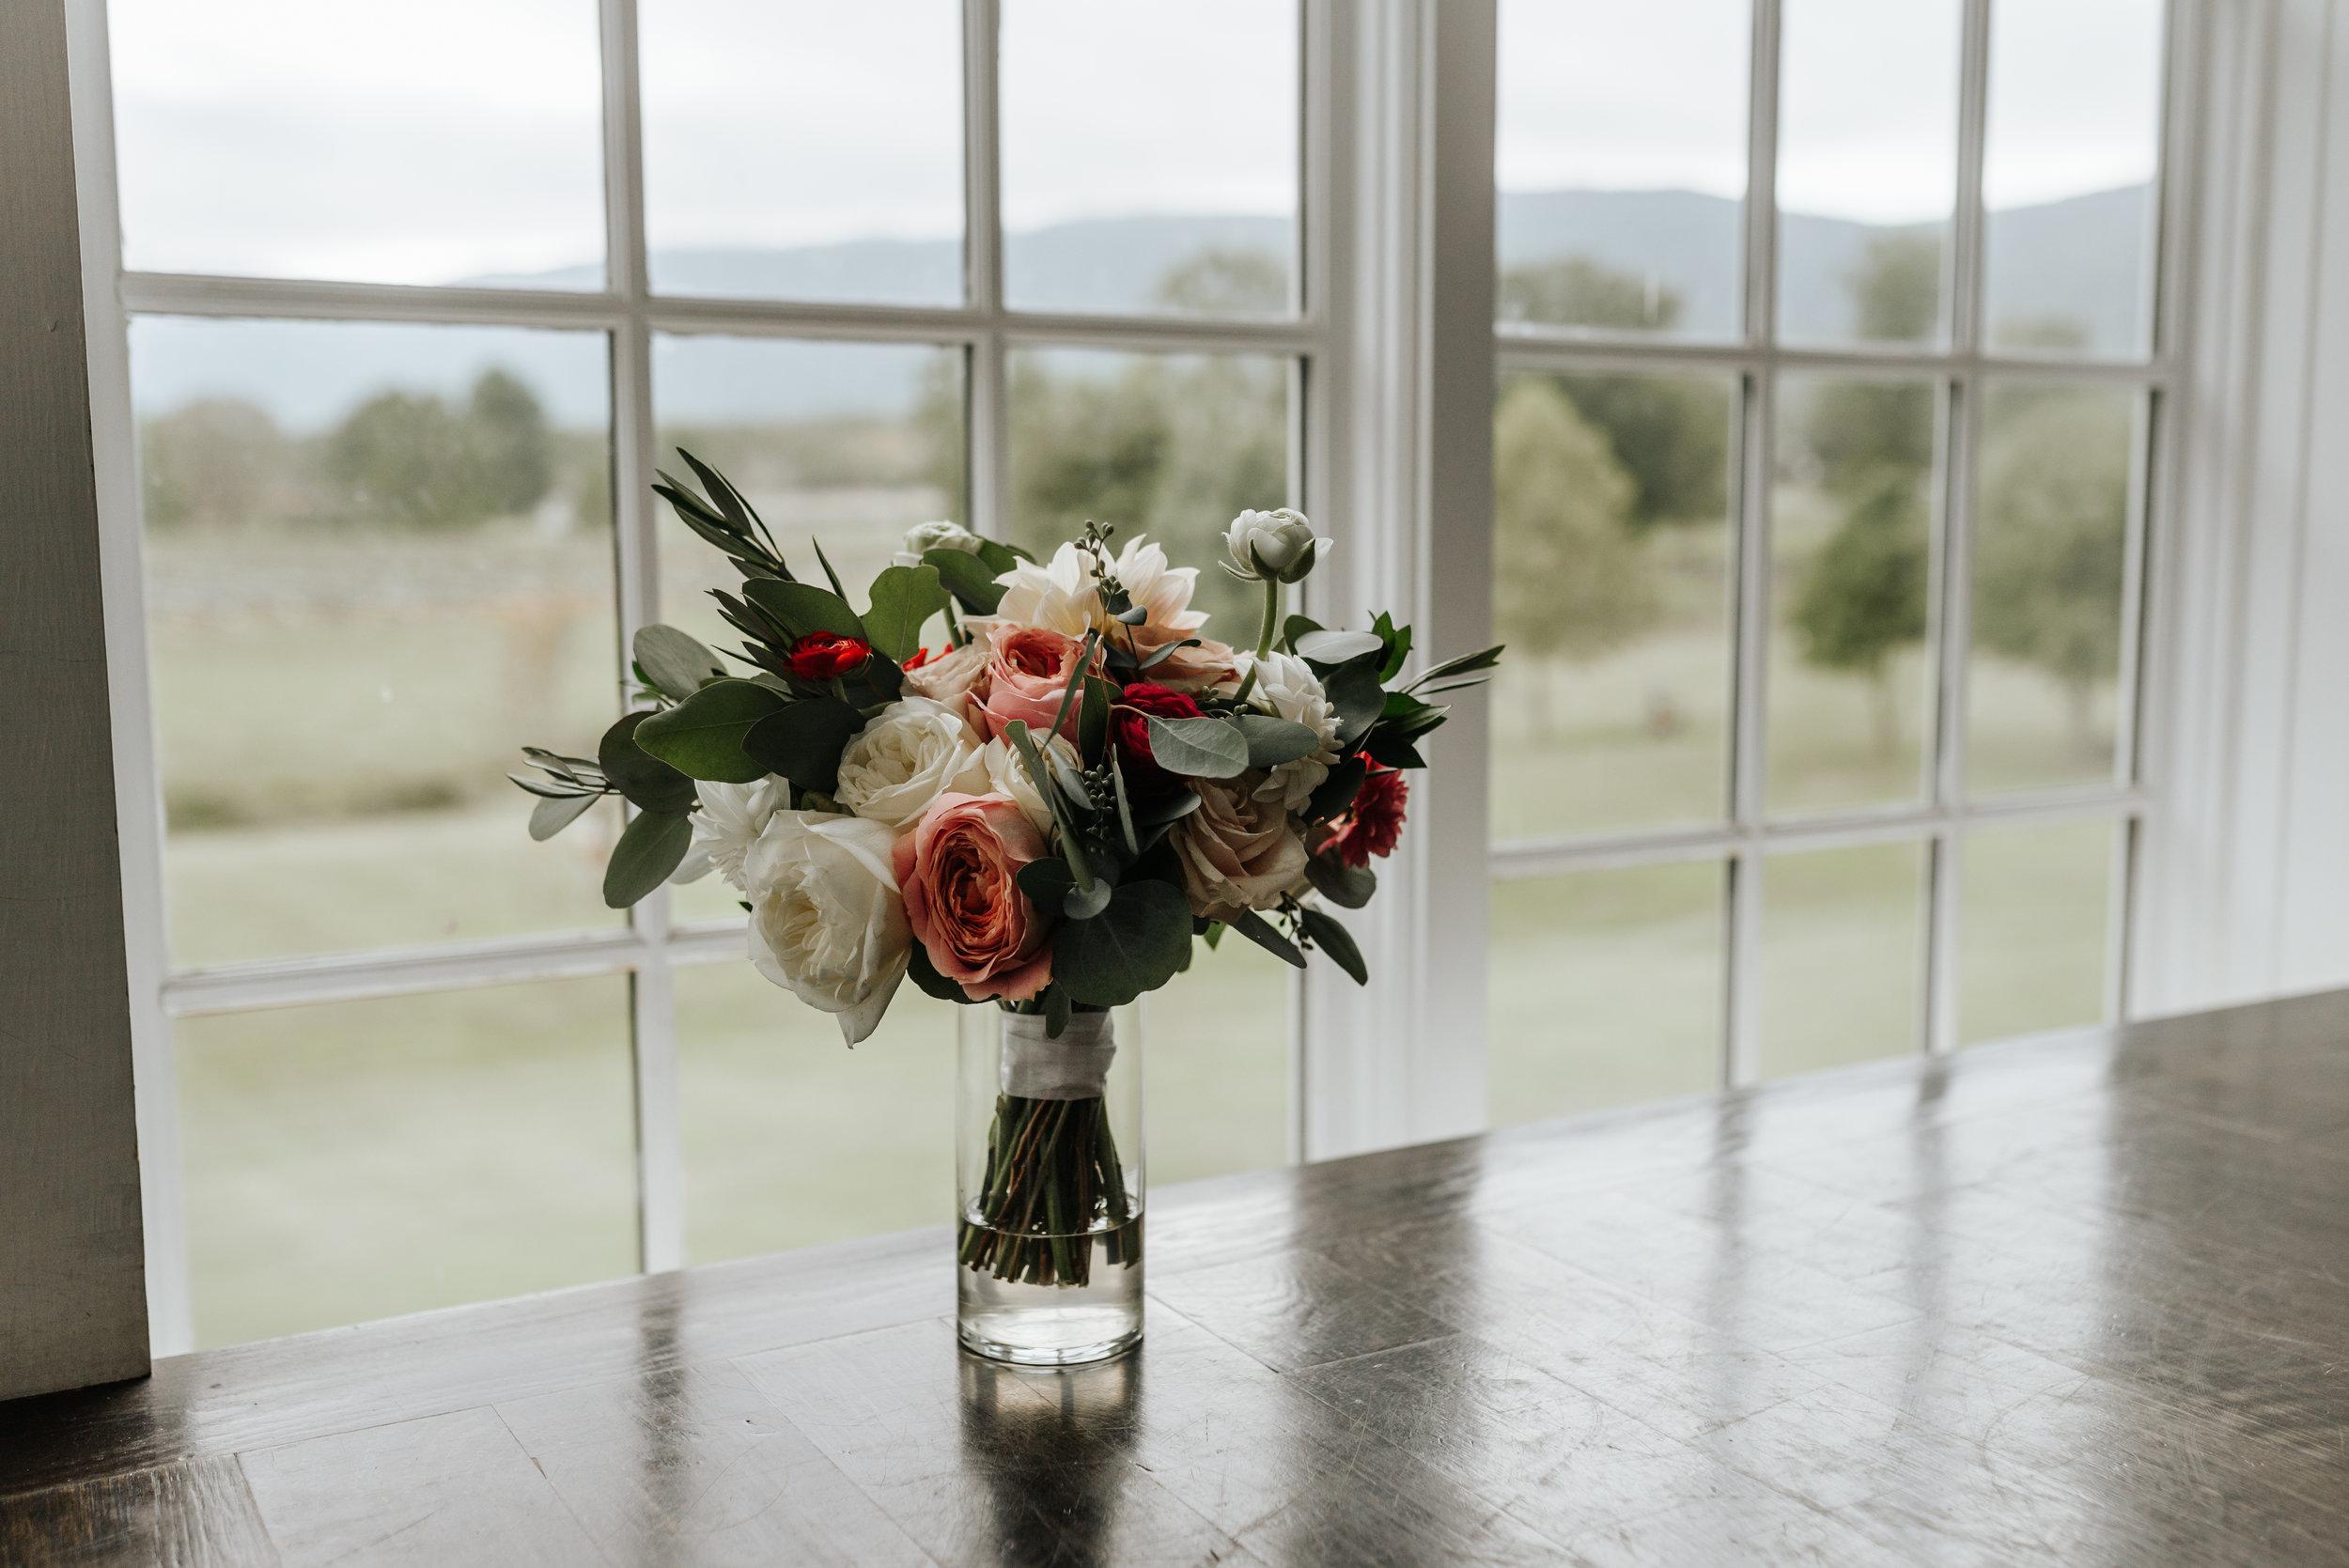 Veritas-Vineyards-and-Winery-Wedding-Photography-Afton-Virginia-Yasmin-Seth-Photography-by-V-9040.jpg